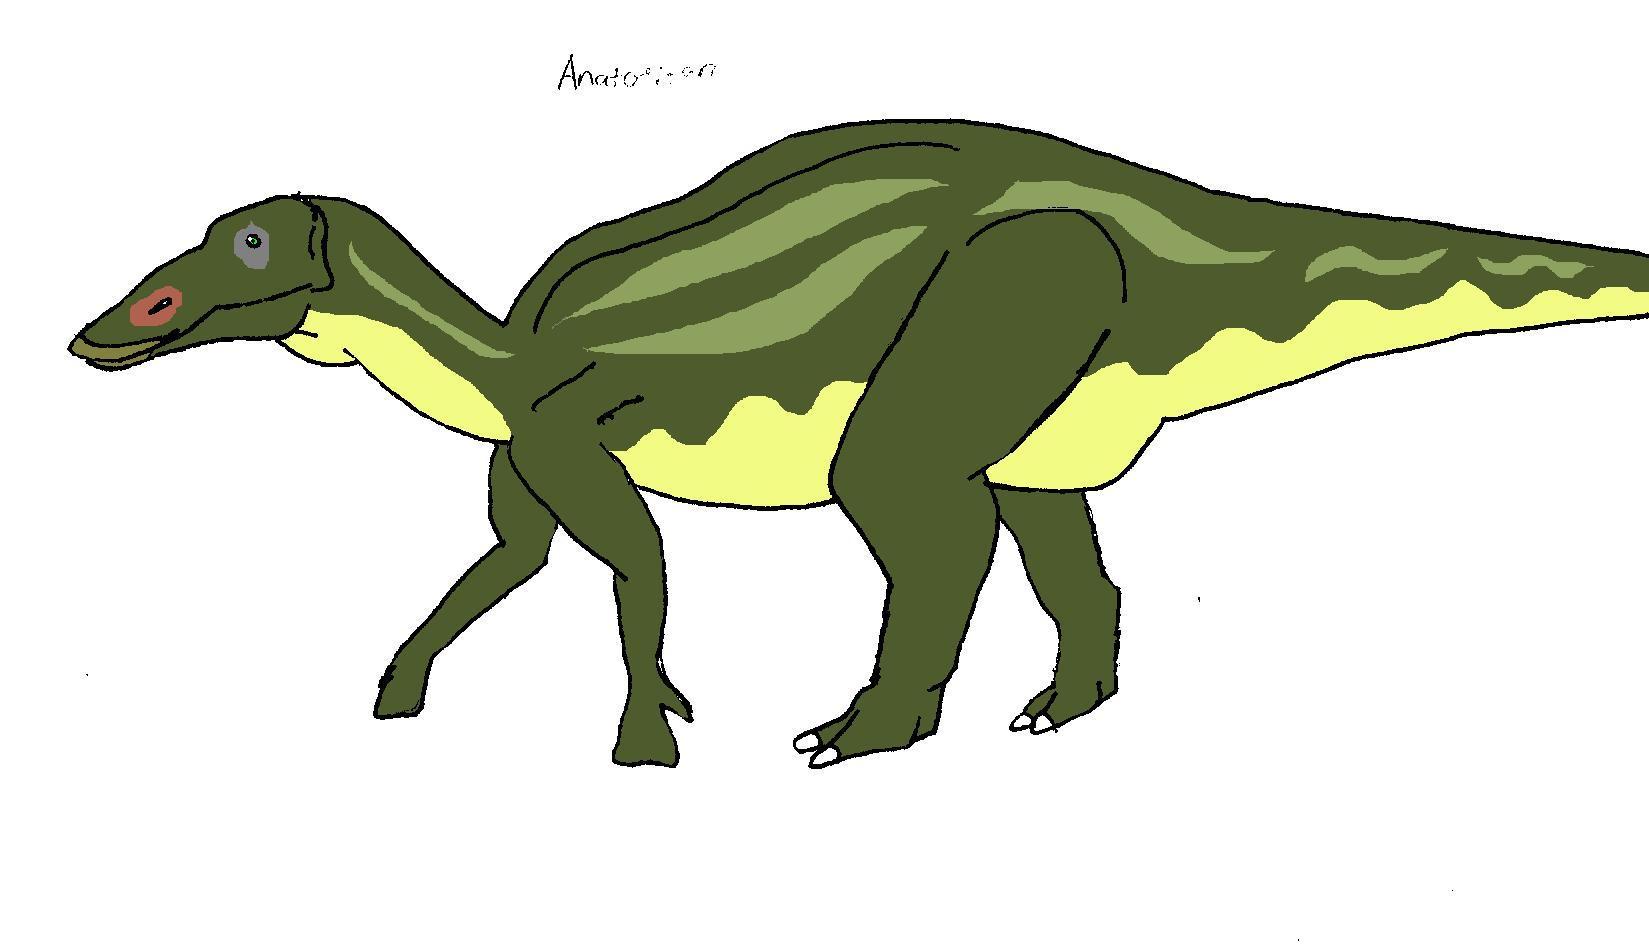 Anatotitan copei by theblazinggecko